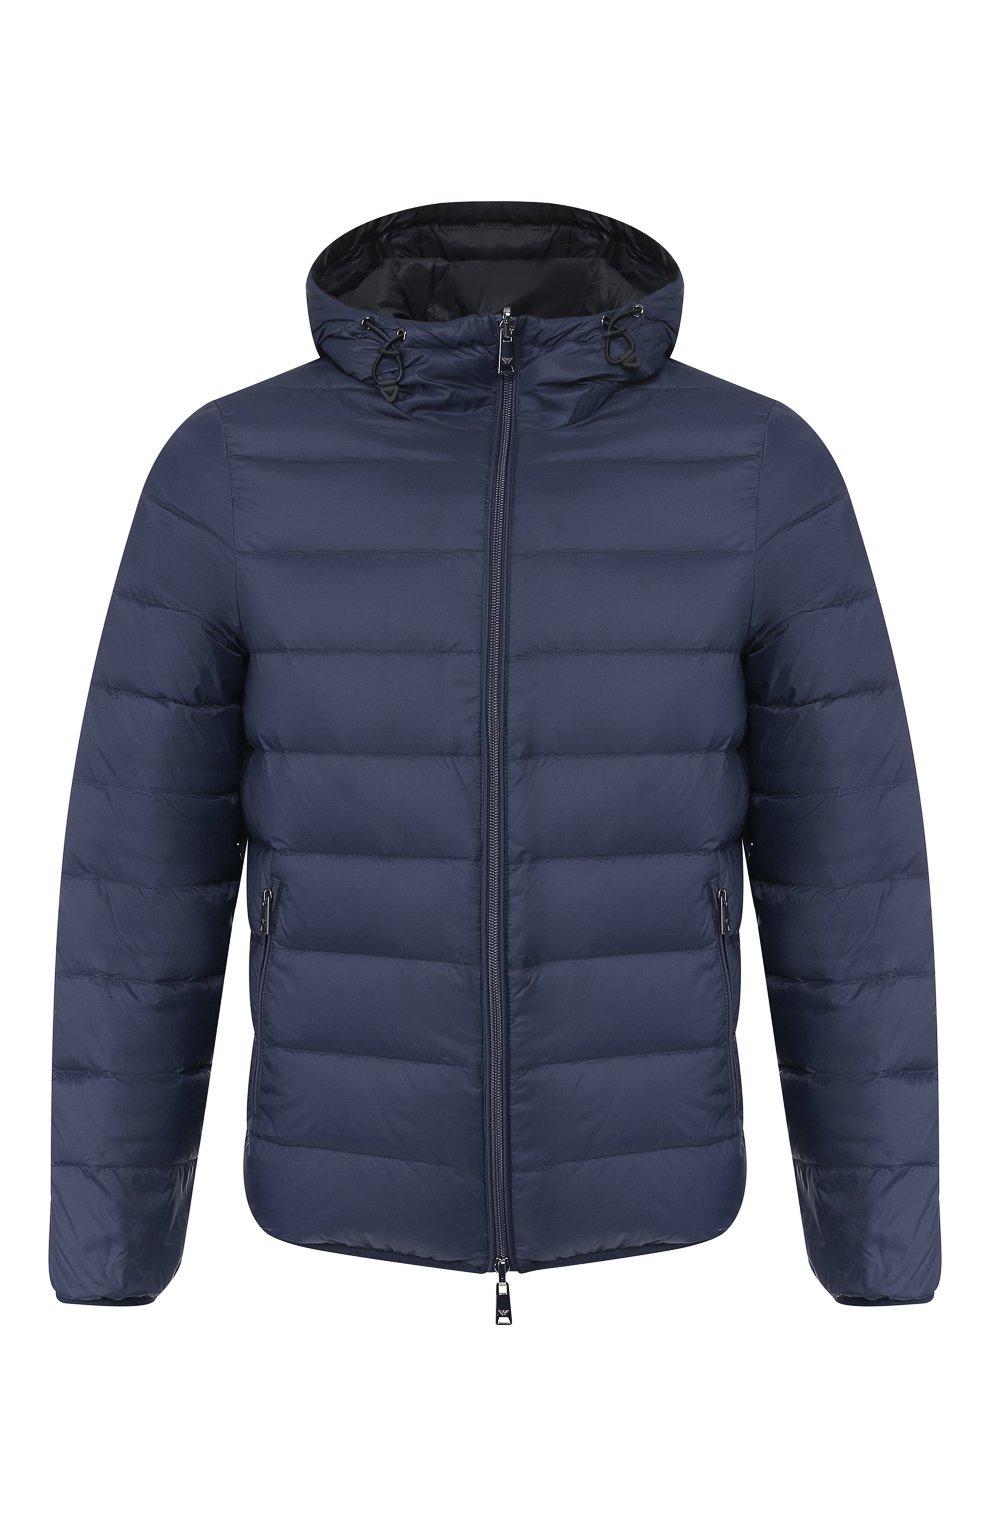 Мужская пуховая куртка EMPORIO ARMANI темно-синего цвета, арт. 8N1B51/1NJMZ   Фото 1